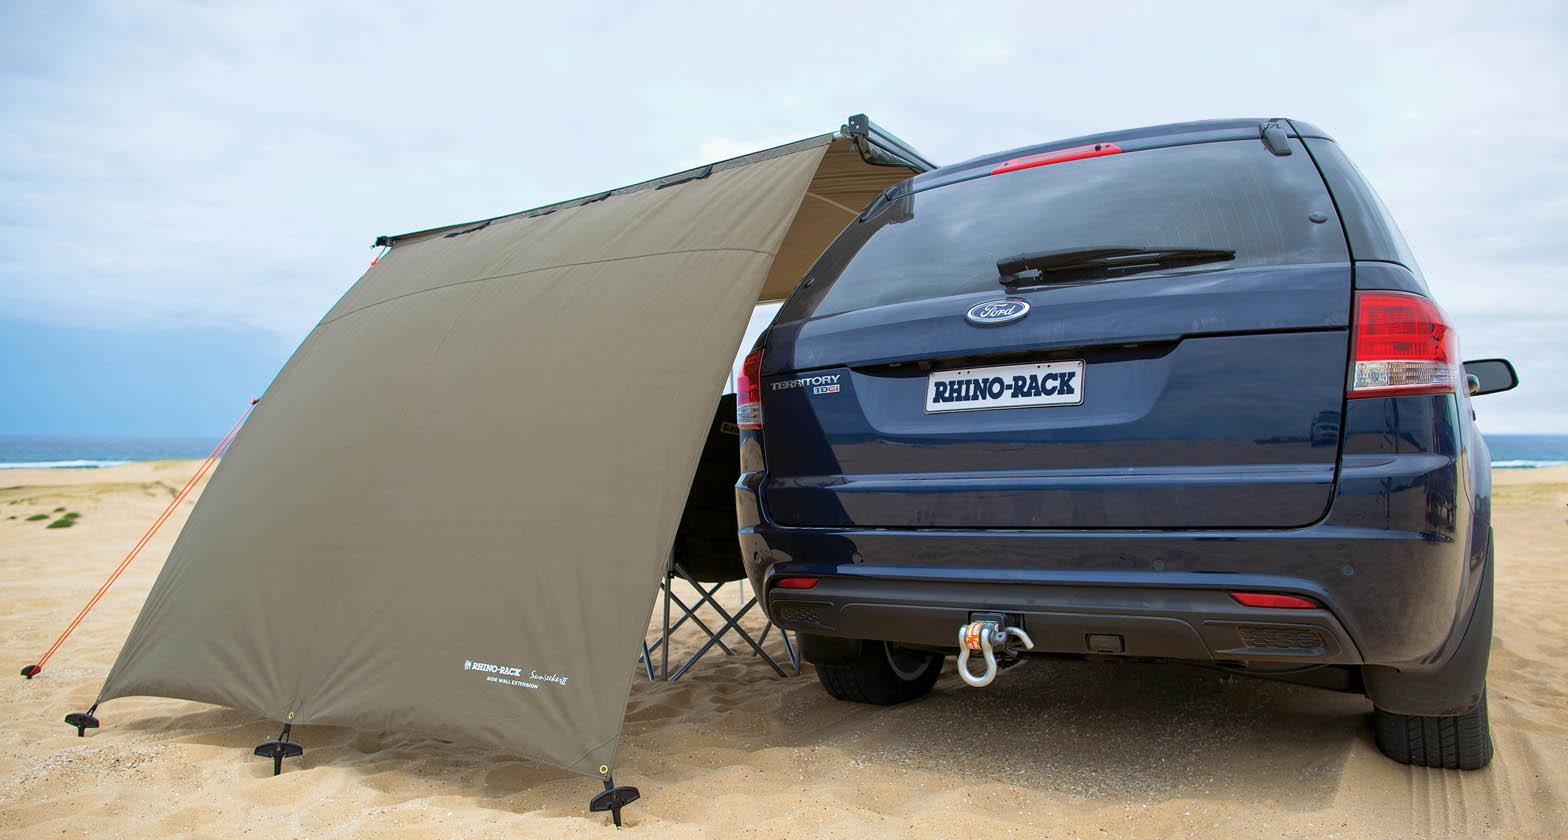 RhinoRack Sunseeker Awning Side Wall ライノラック サンシーカー オーニング サイドウォール